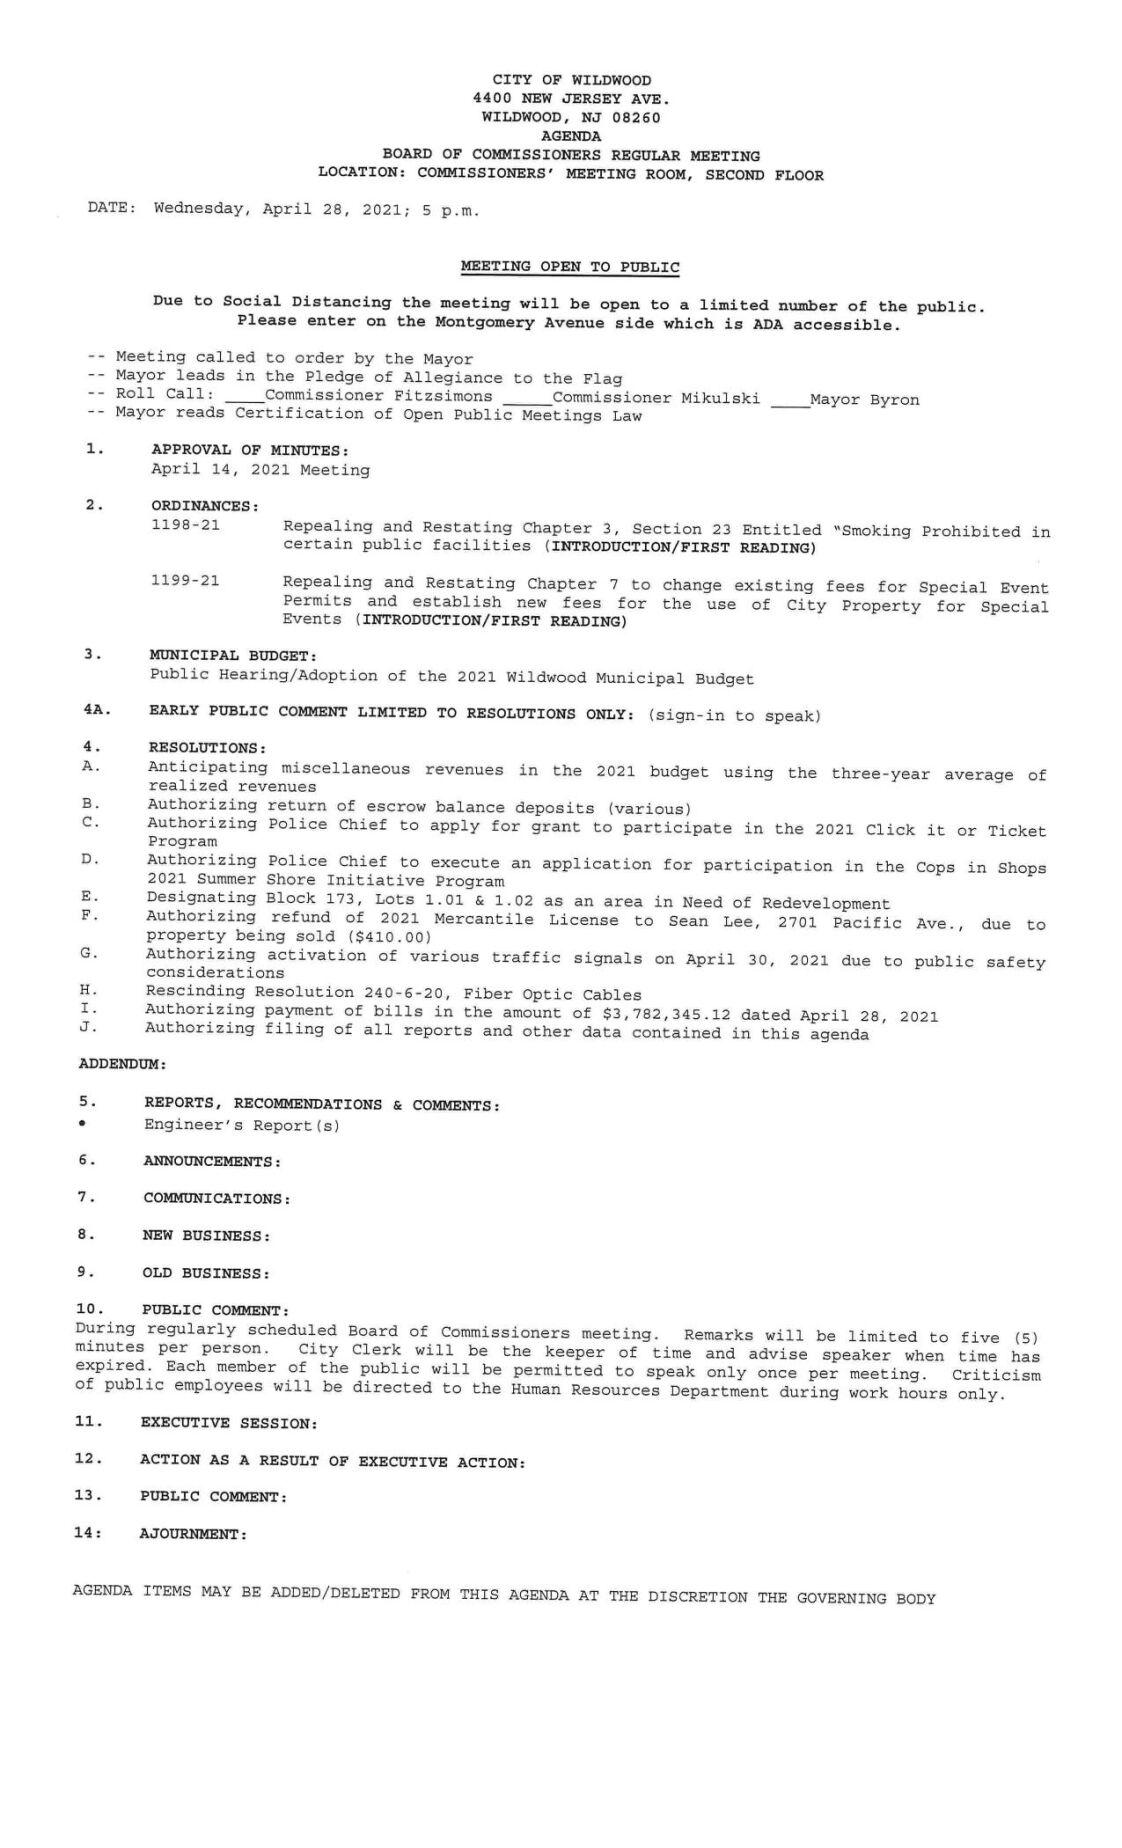 Wildwood City Commissioners Meeting Agenda April 28, 2021